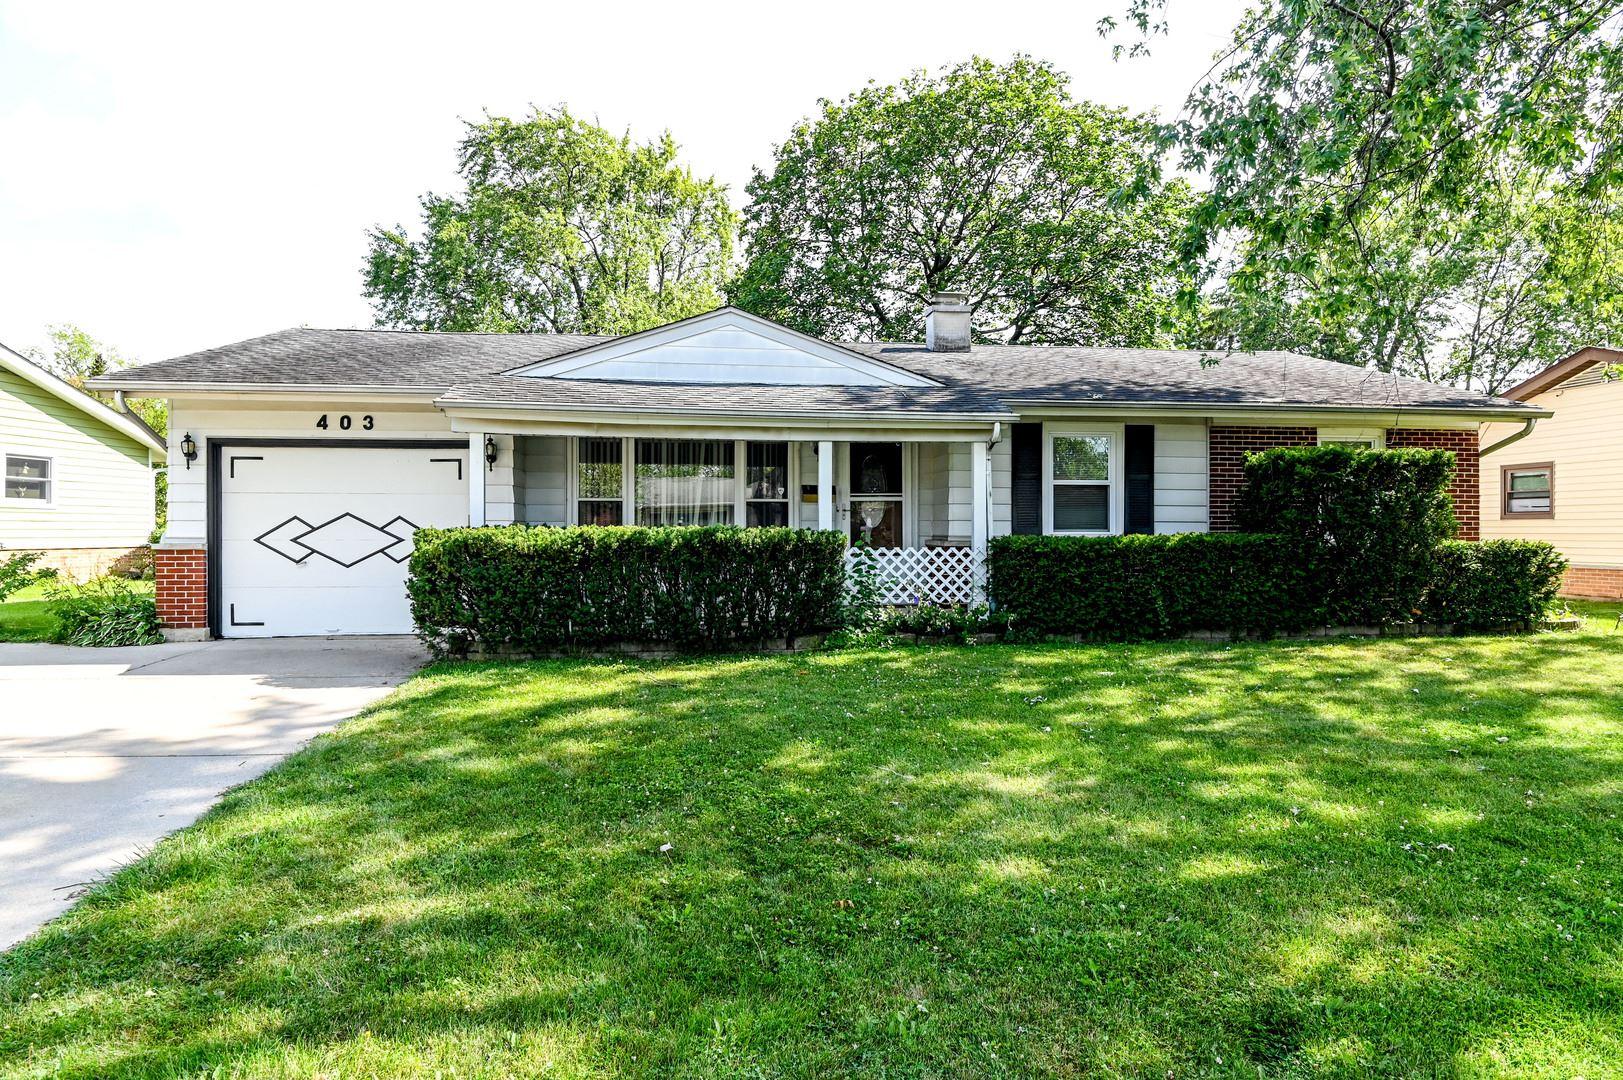 403 Birchwood Avenue, Elk Grove Village, IL 60007 - #: 11165379